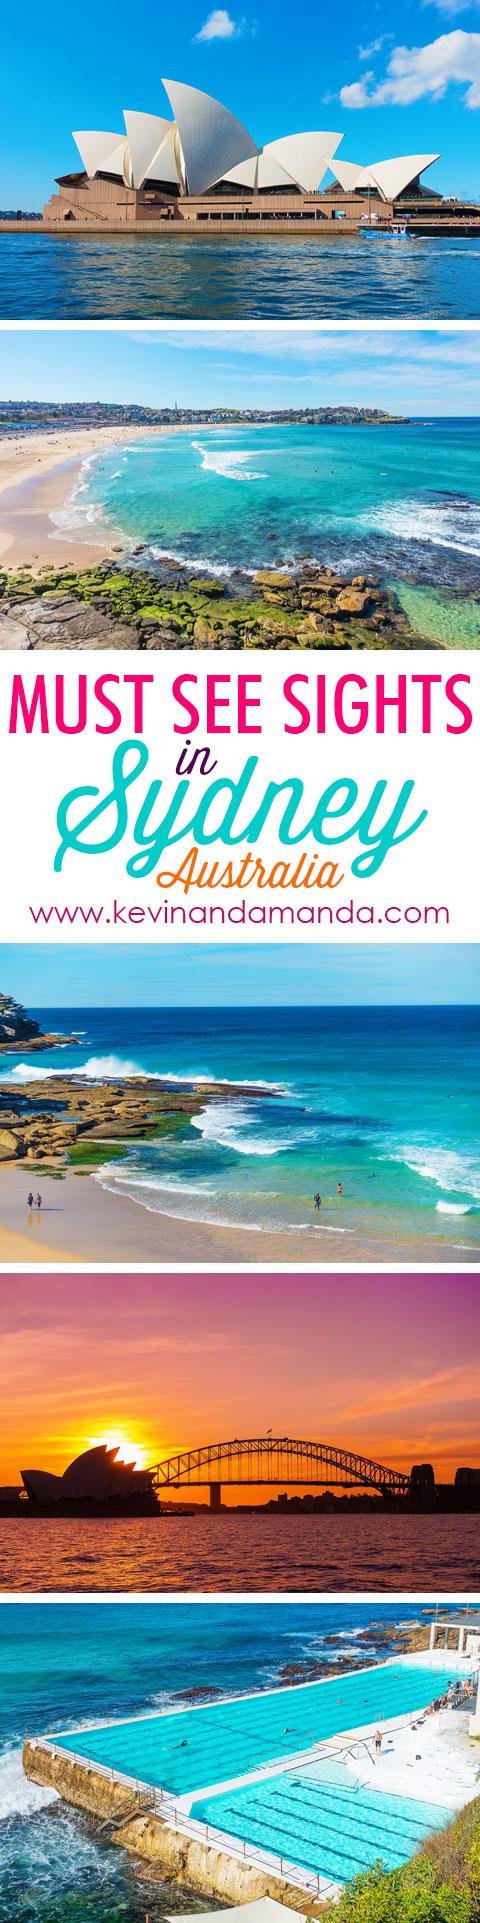 Add these stunning Sydney, Australia sights to your bucket list ASAP!